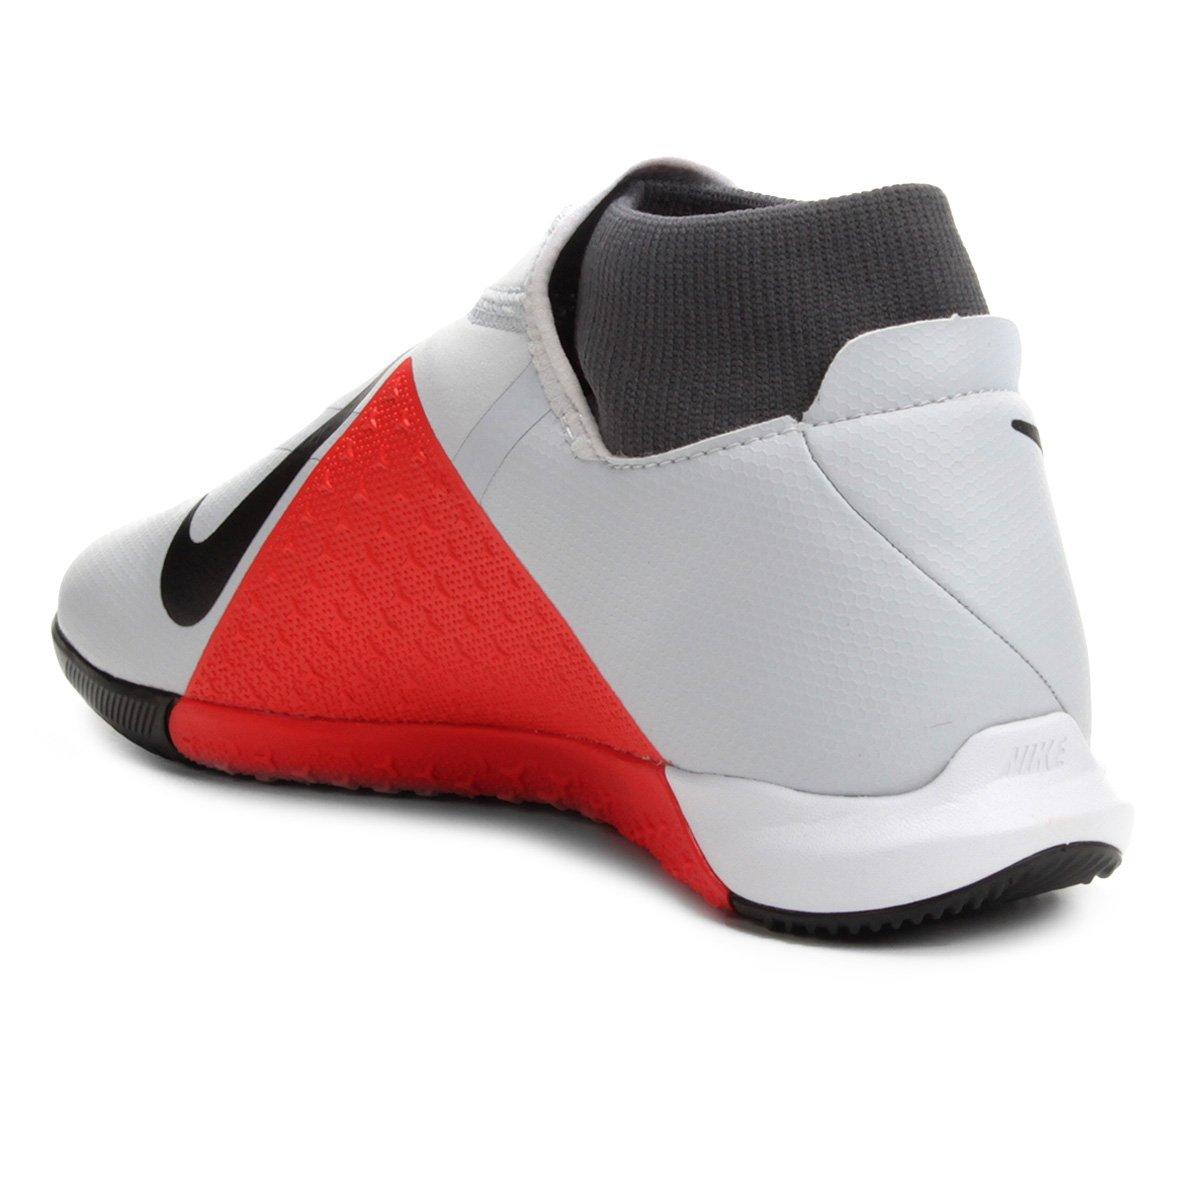 Chuteira Futsal Nike Phantom Vision Academy DF IC - Cinza - Compre ... 6c4f0fc7e447f